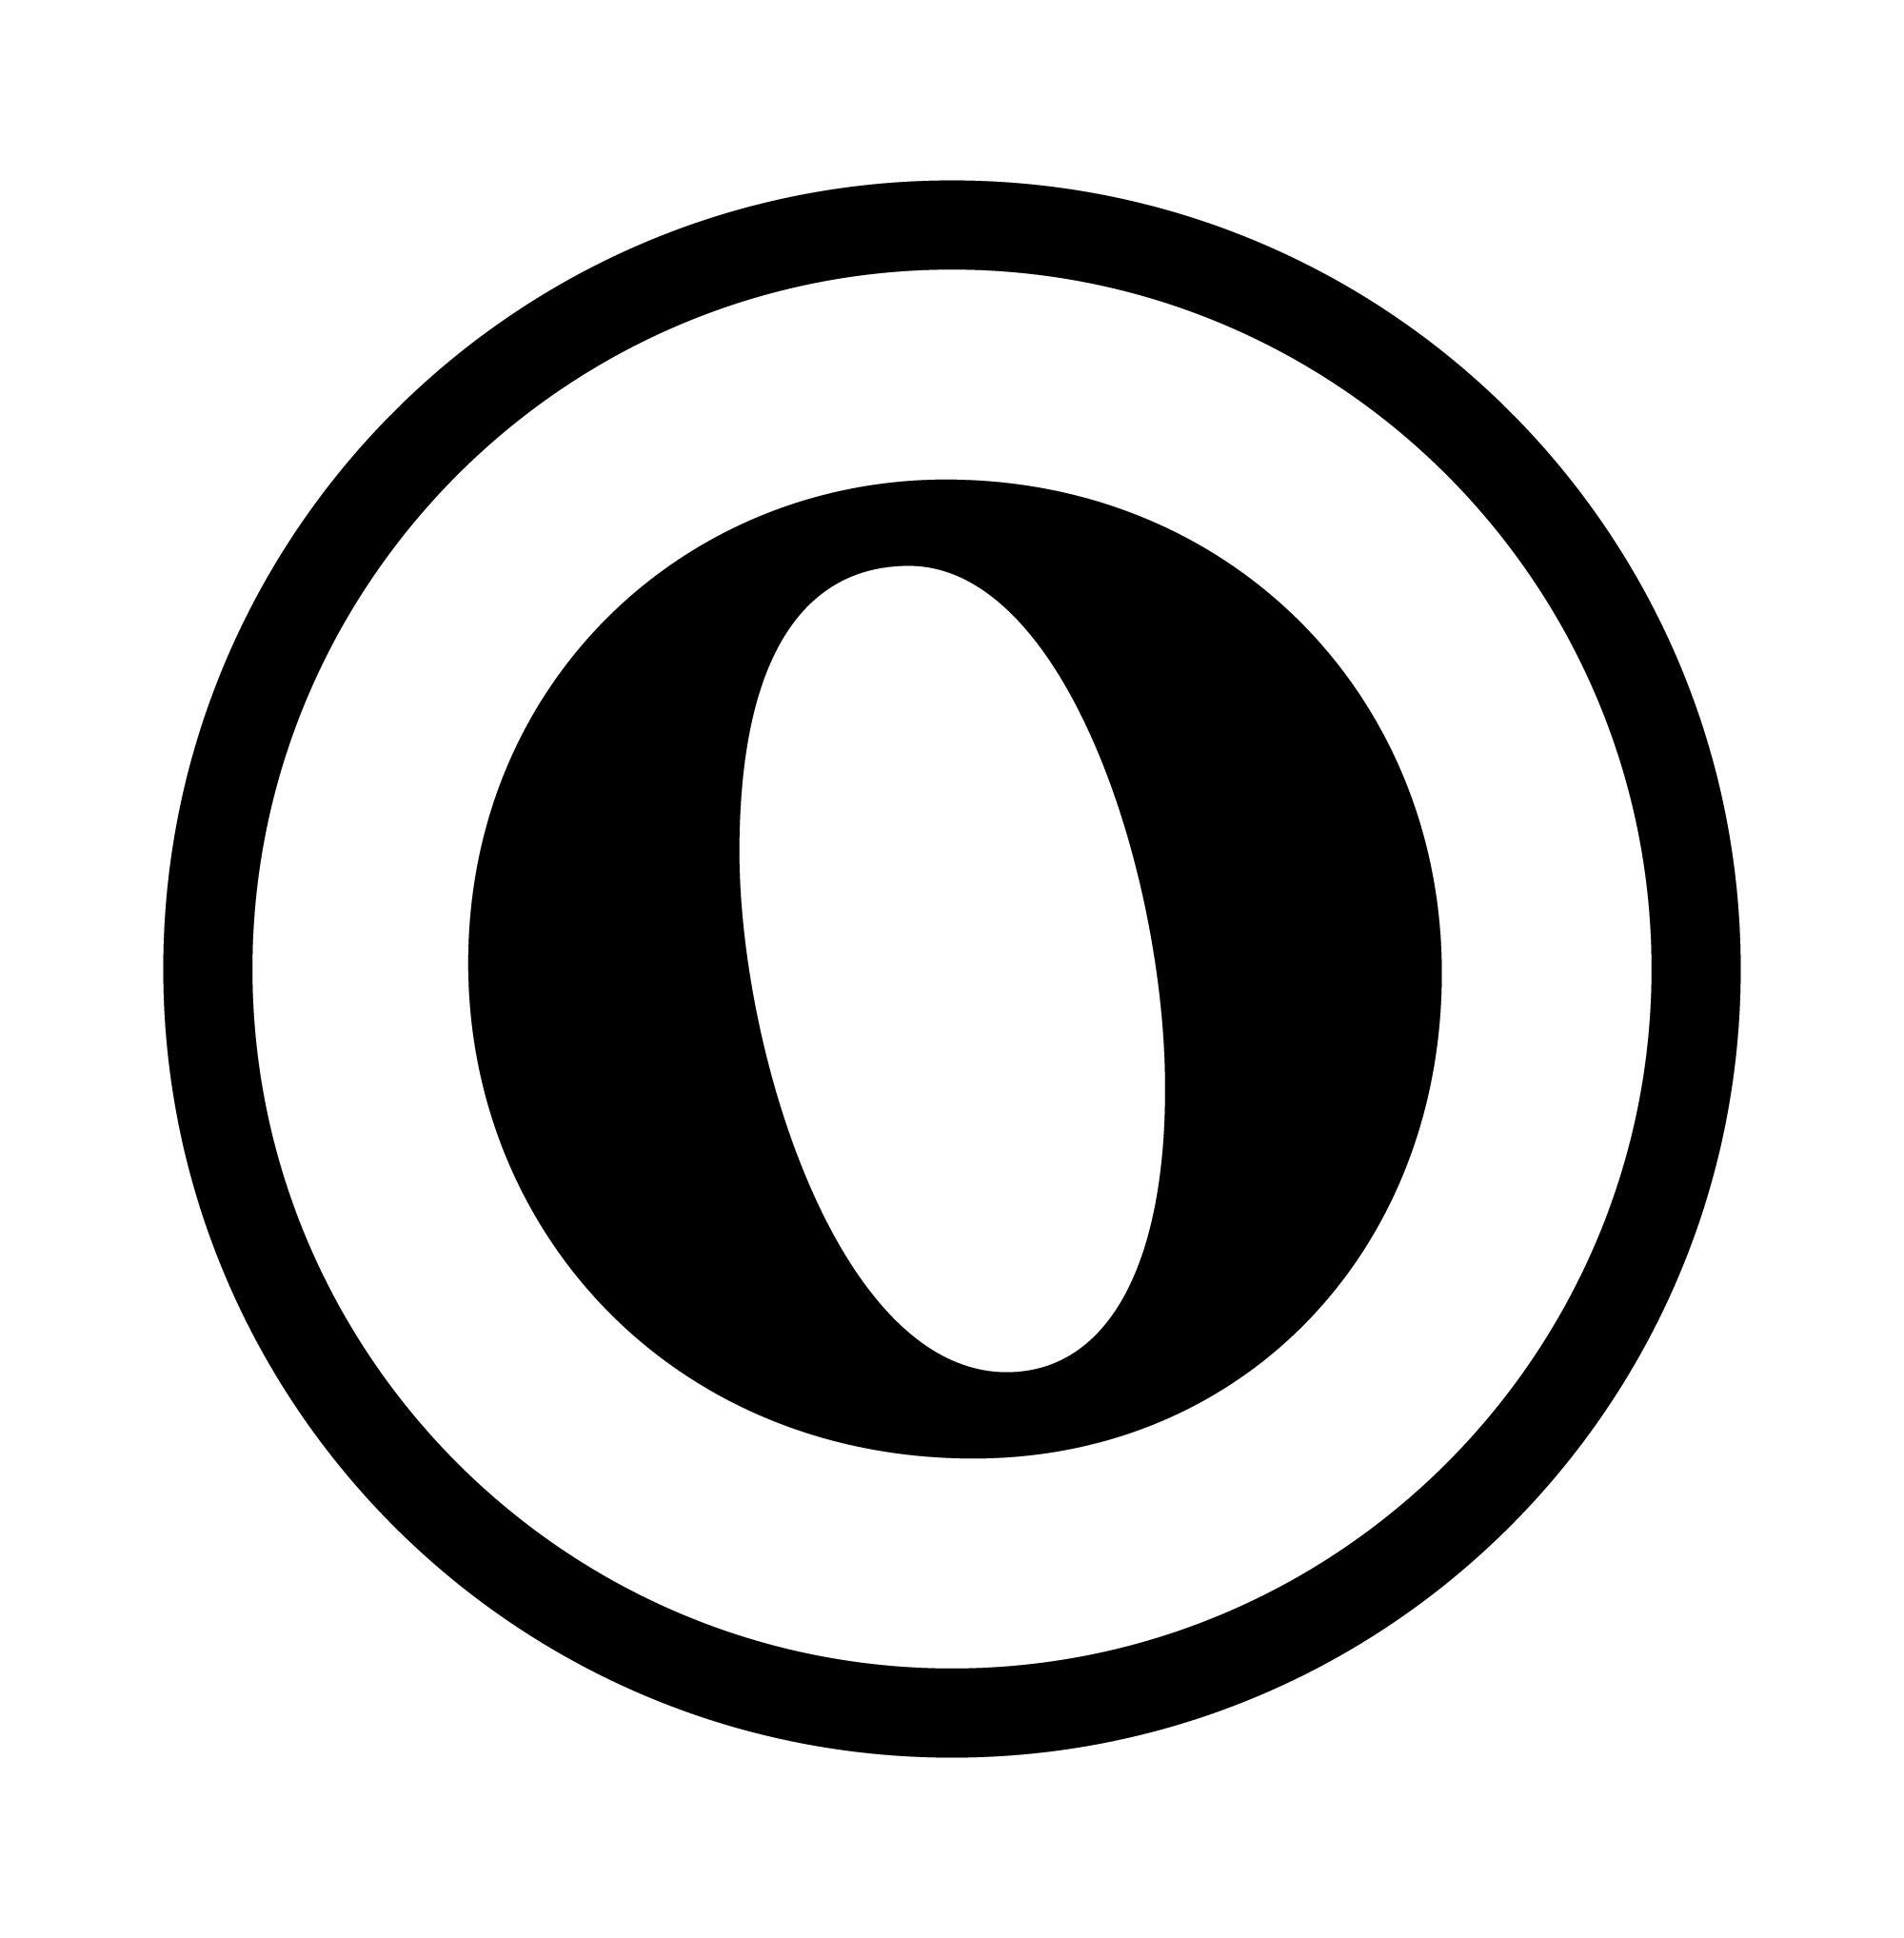 Profil pic